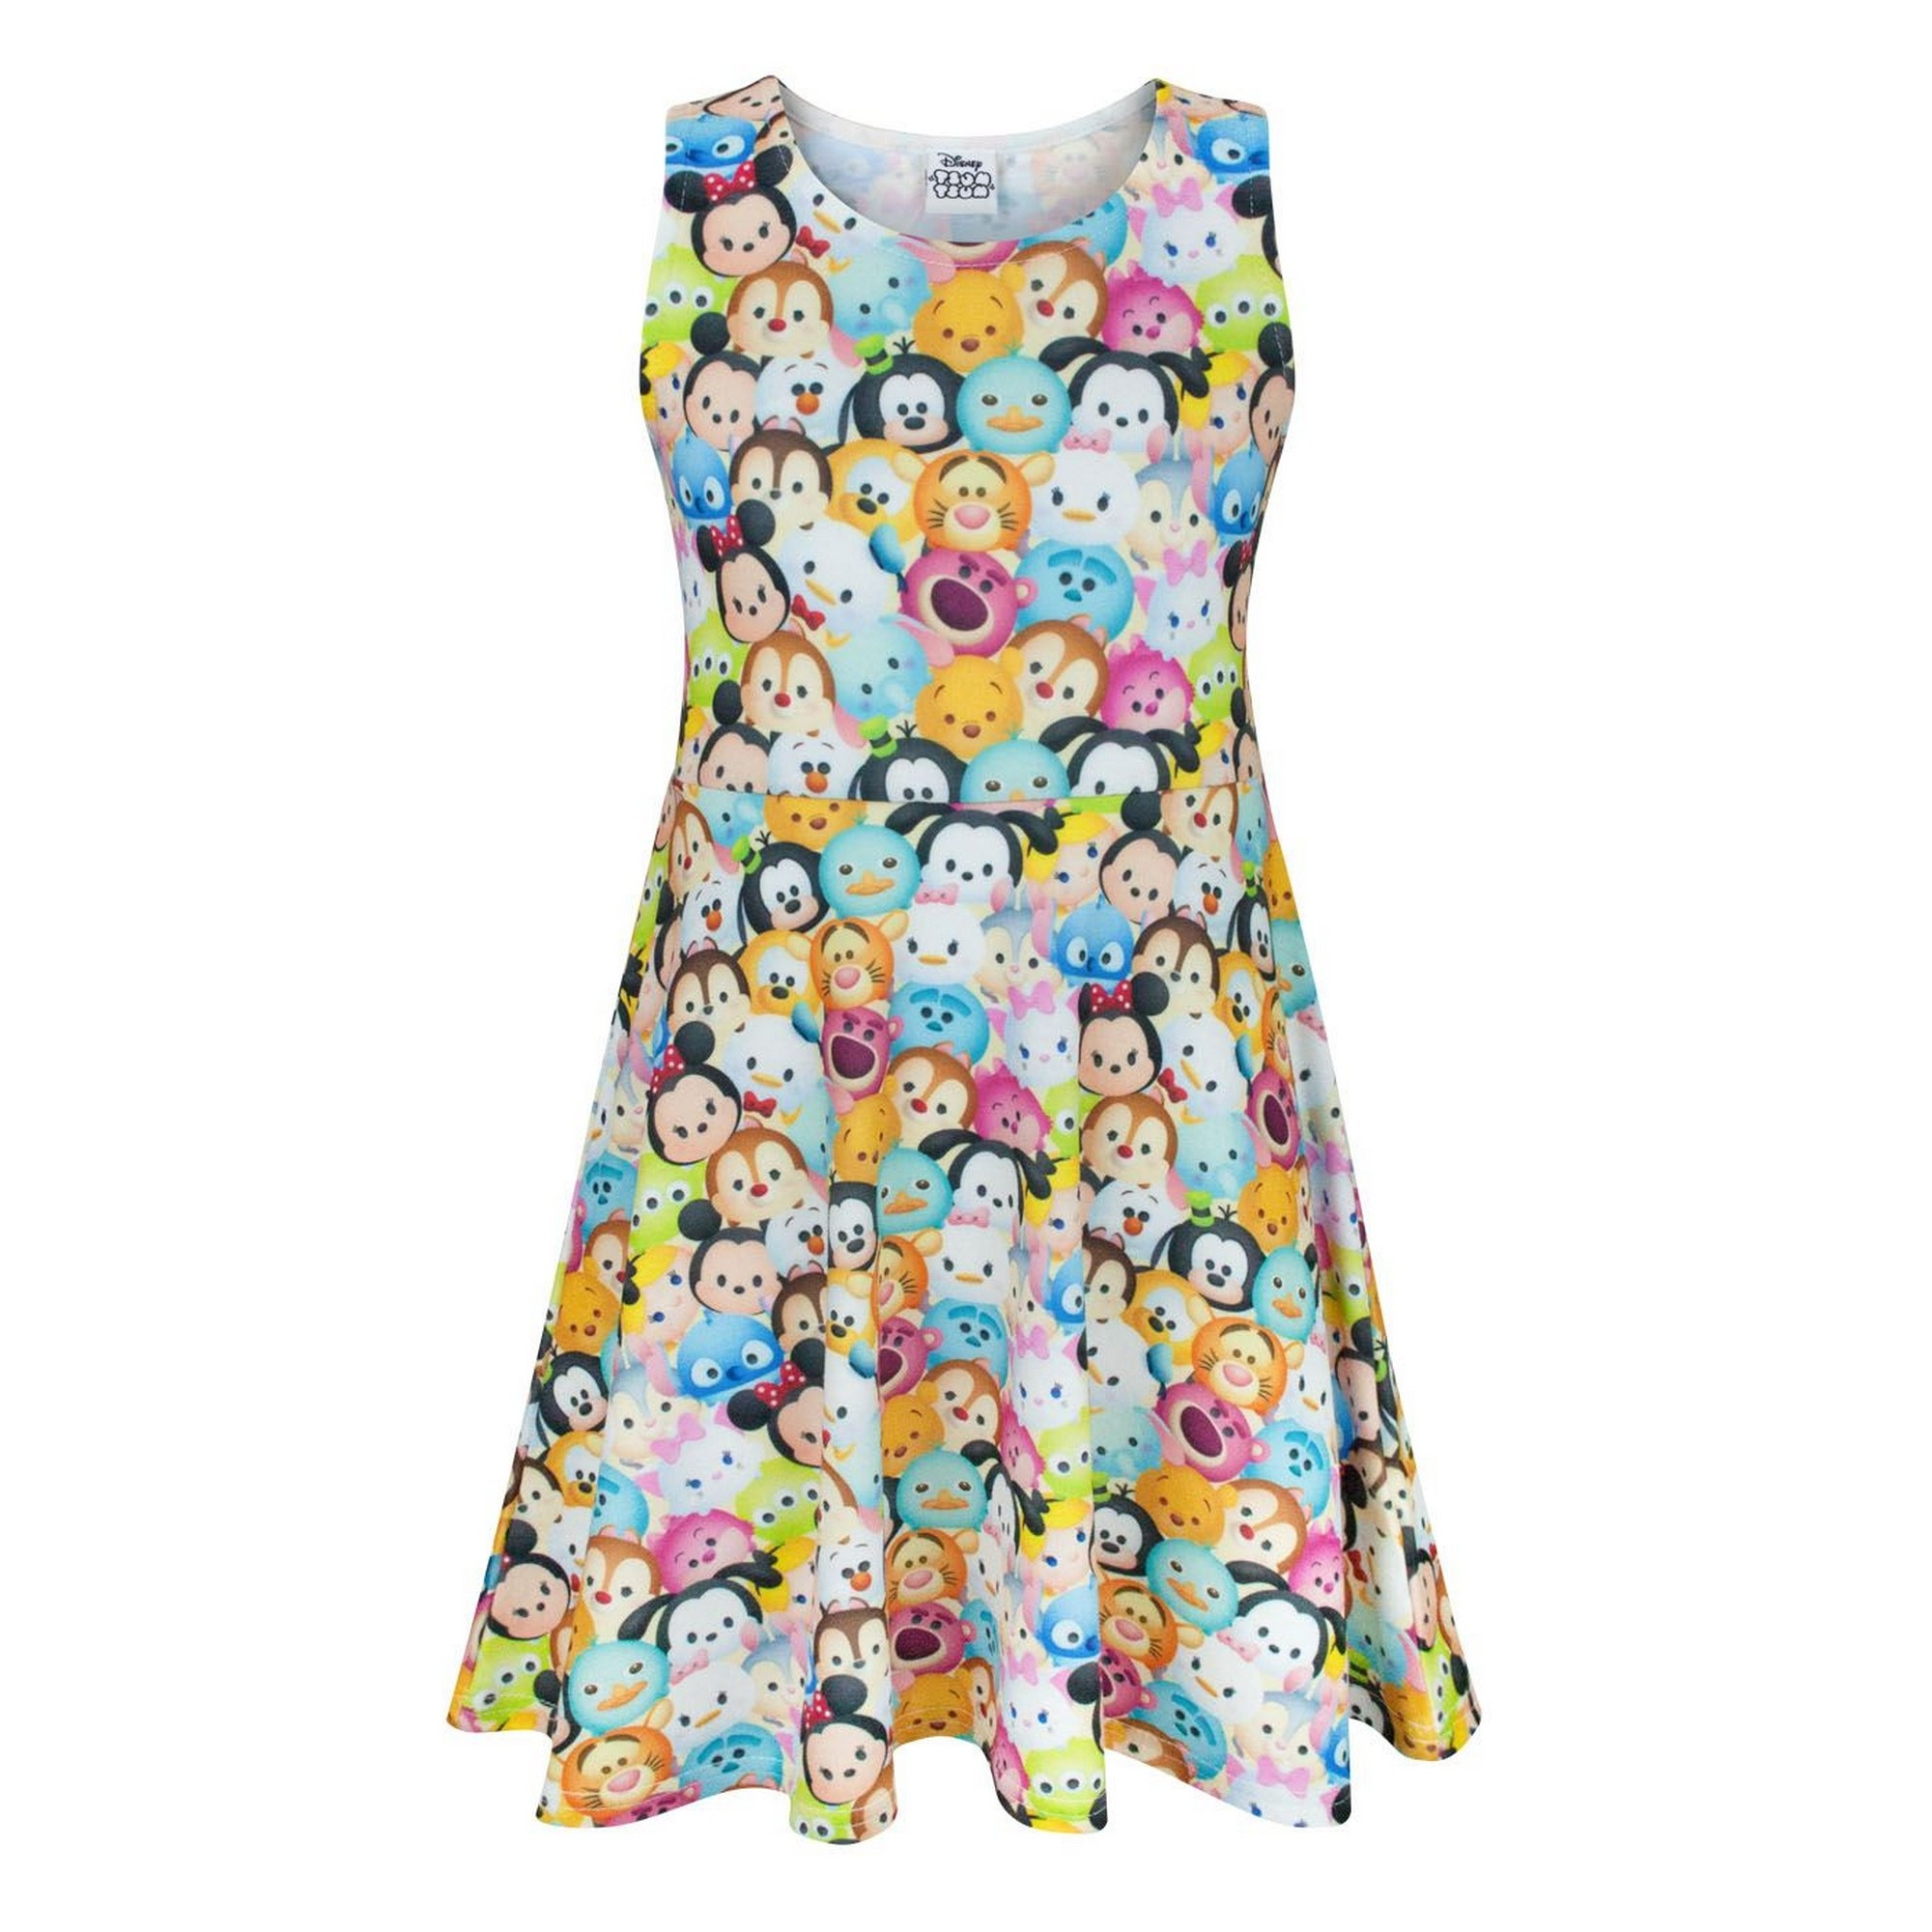 572308974fcff Details about Disney Childrens/Girls Official Tsum Tsum Character Skater  Dress (NS329)